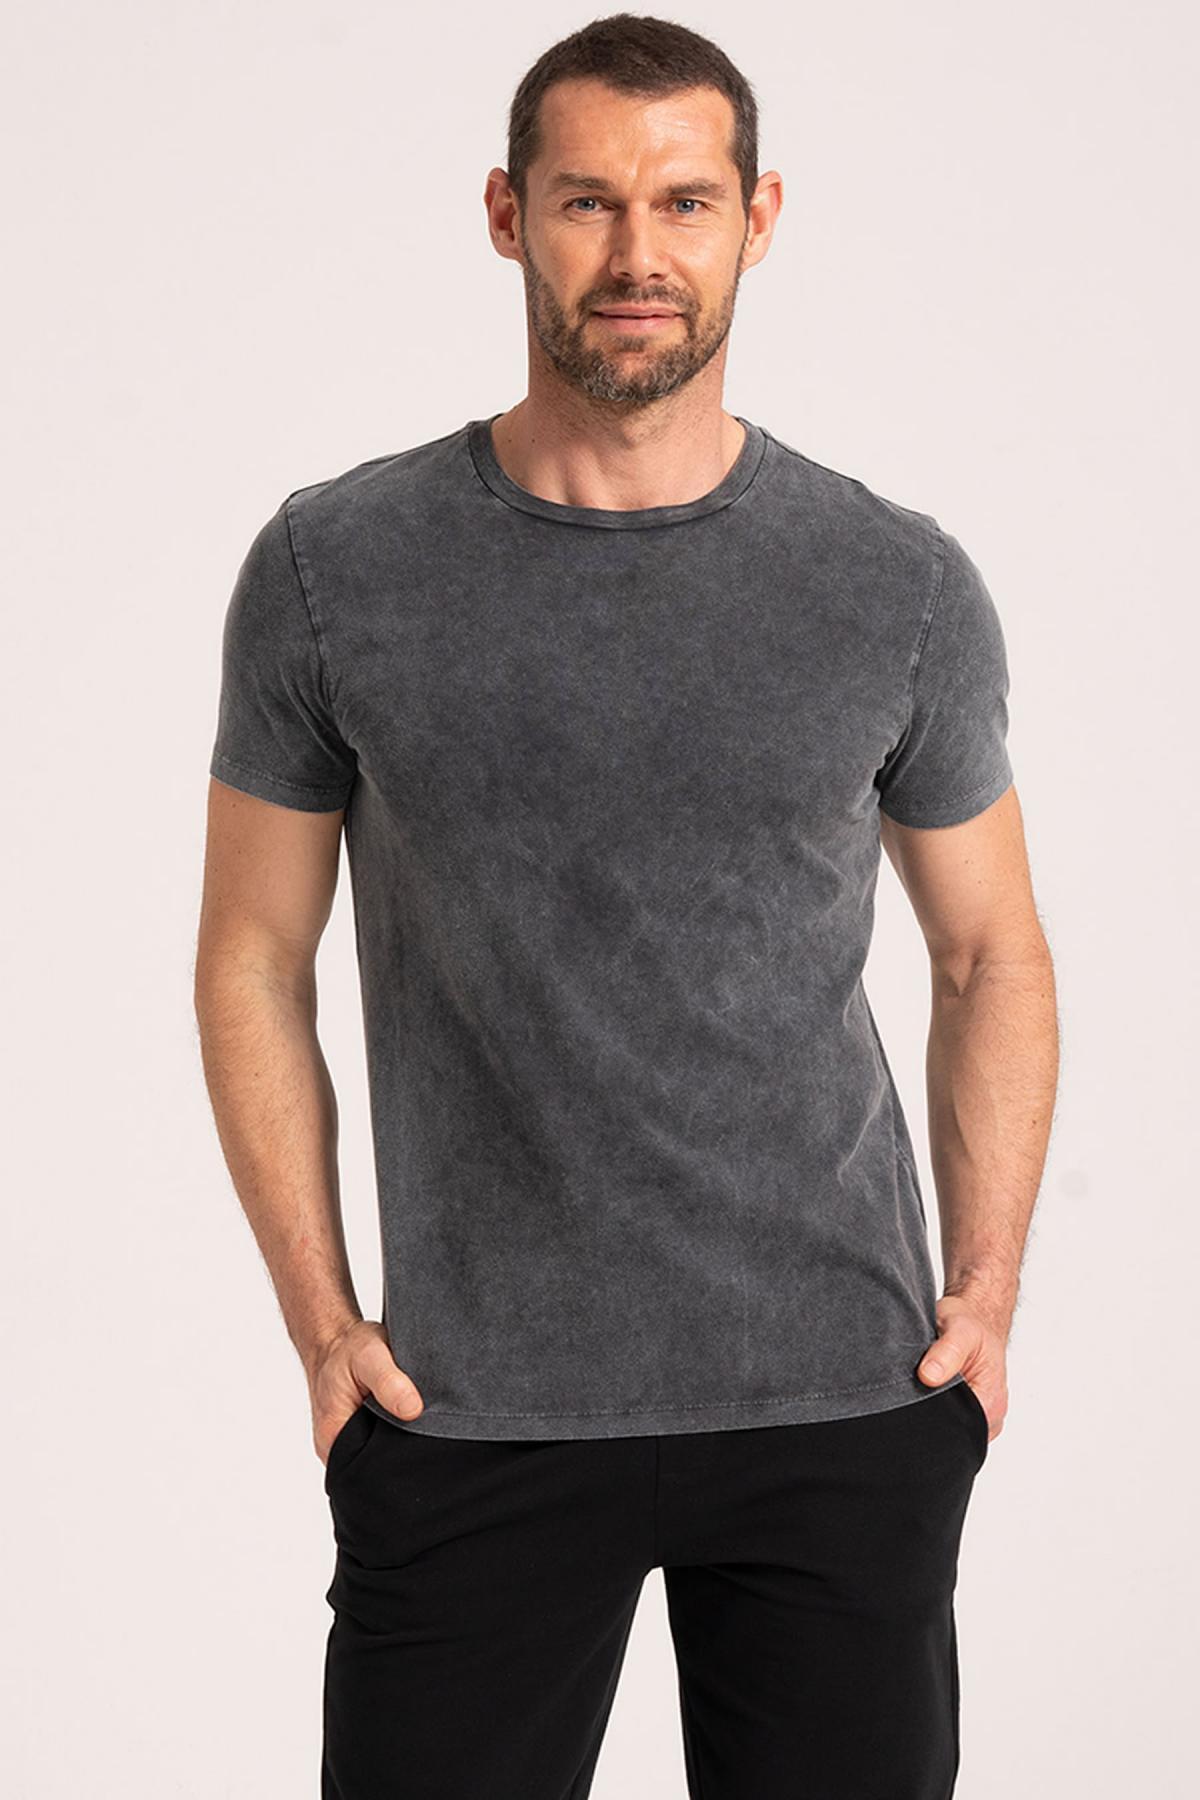 Vintage Effect T-Shirt newces-5010-BV